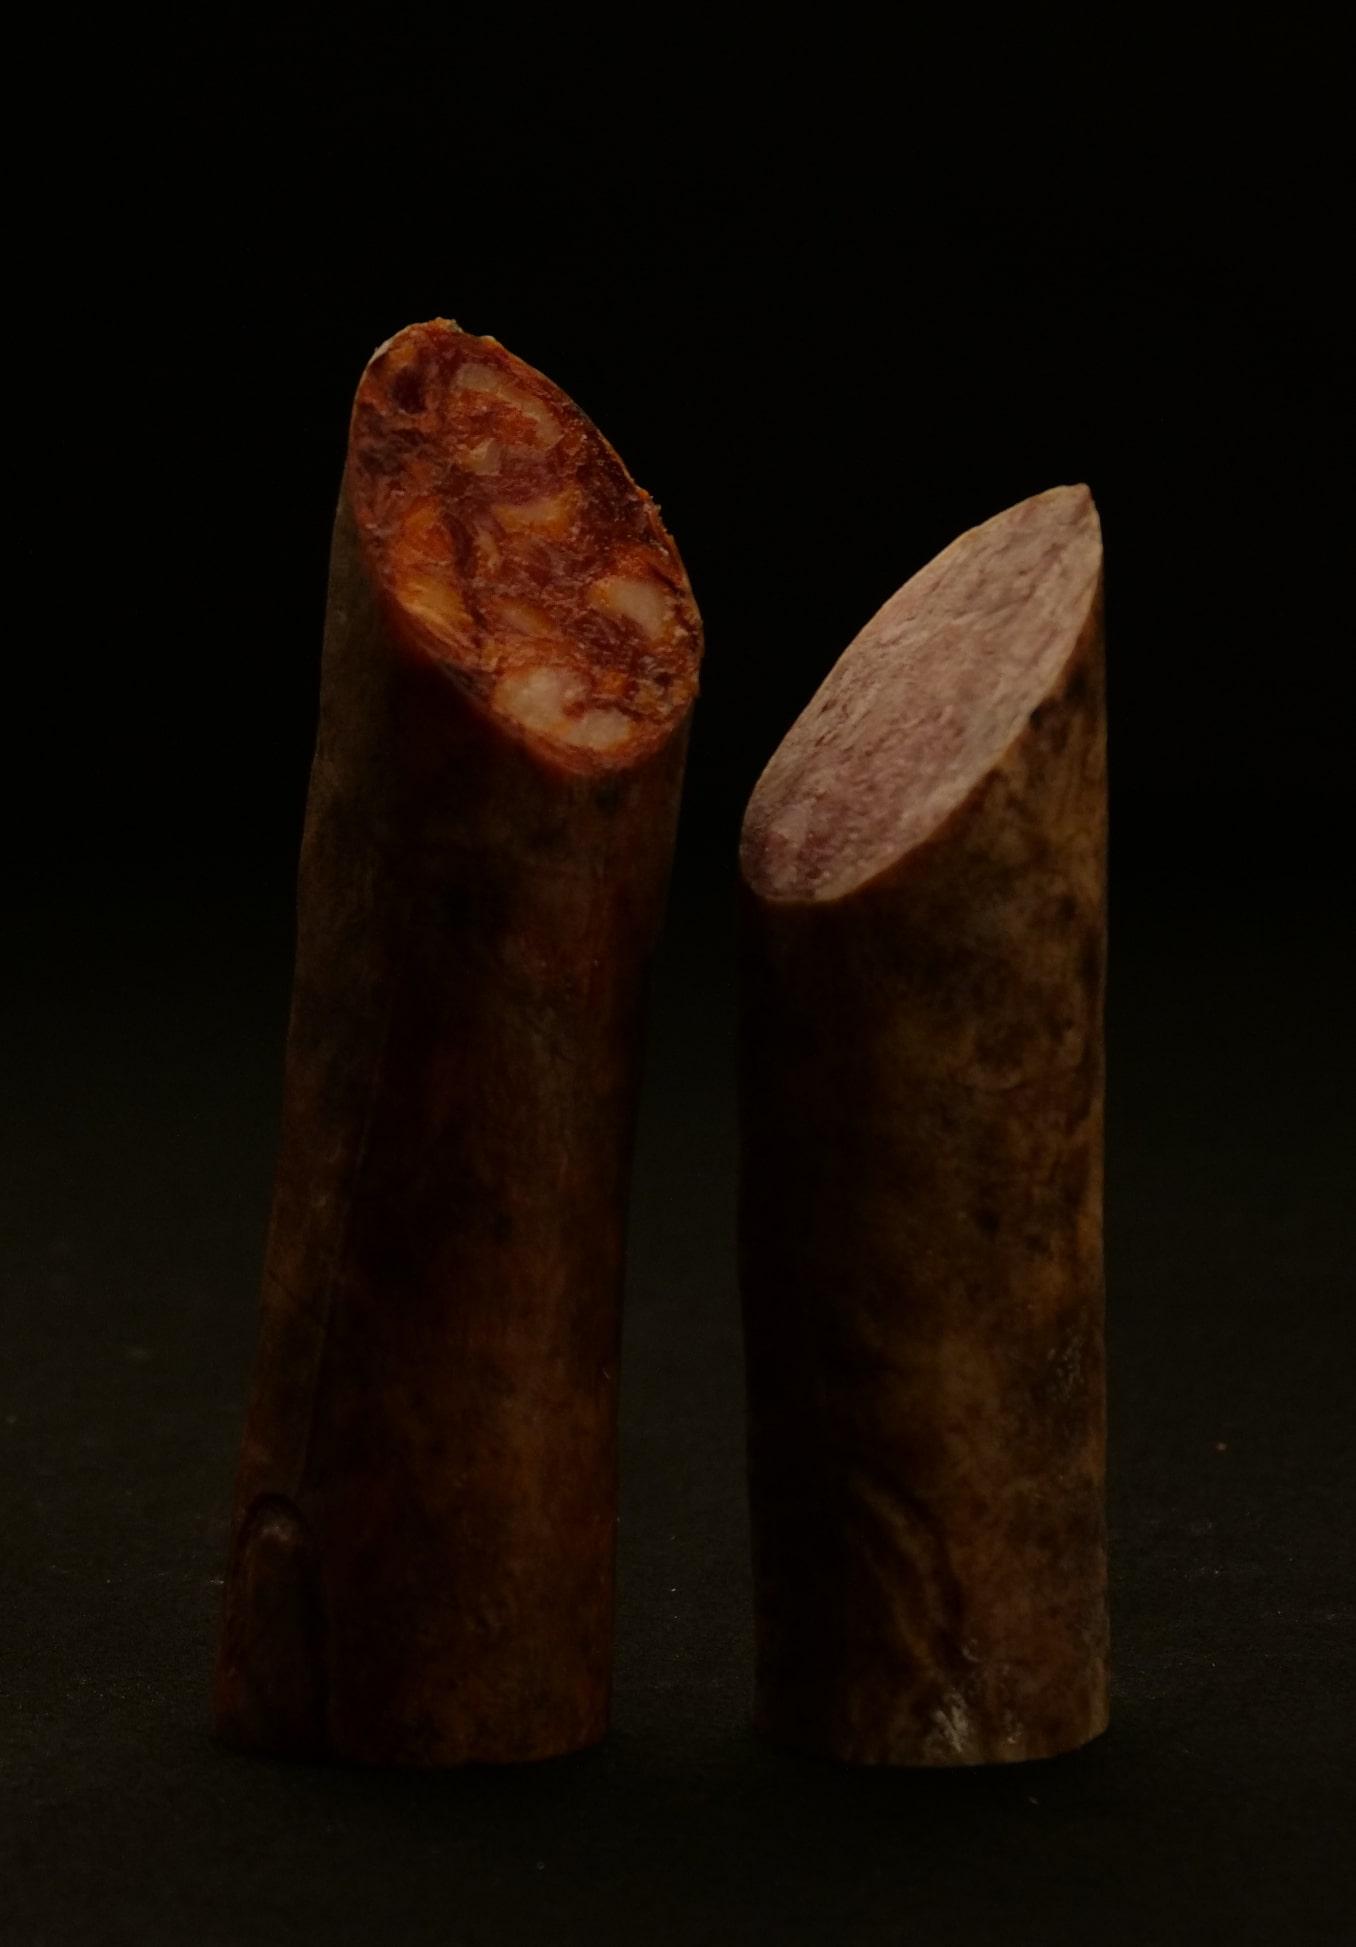 Los Eternos: Chorizo & Salchichón Joselito